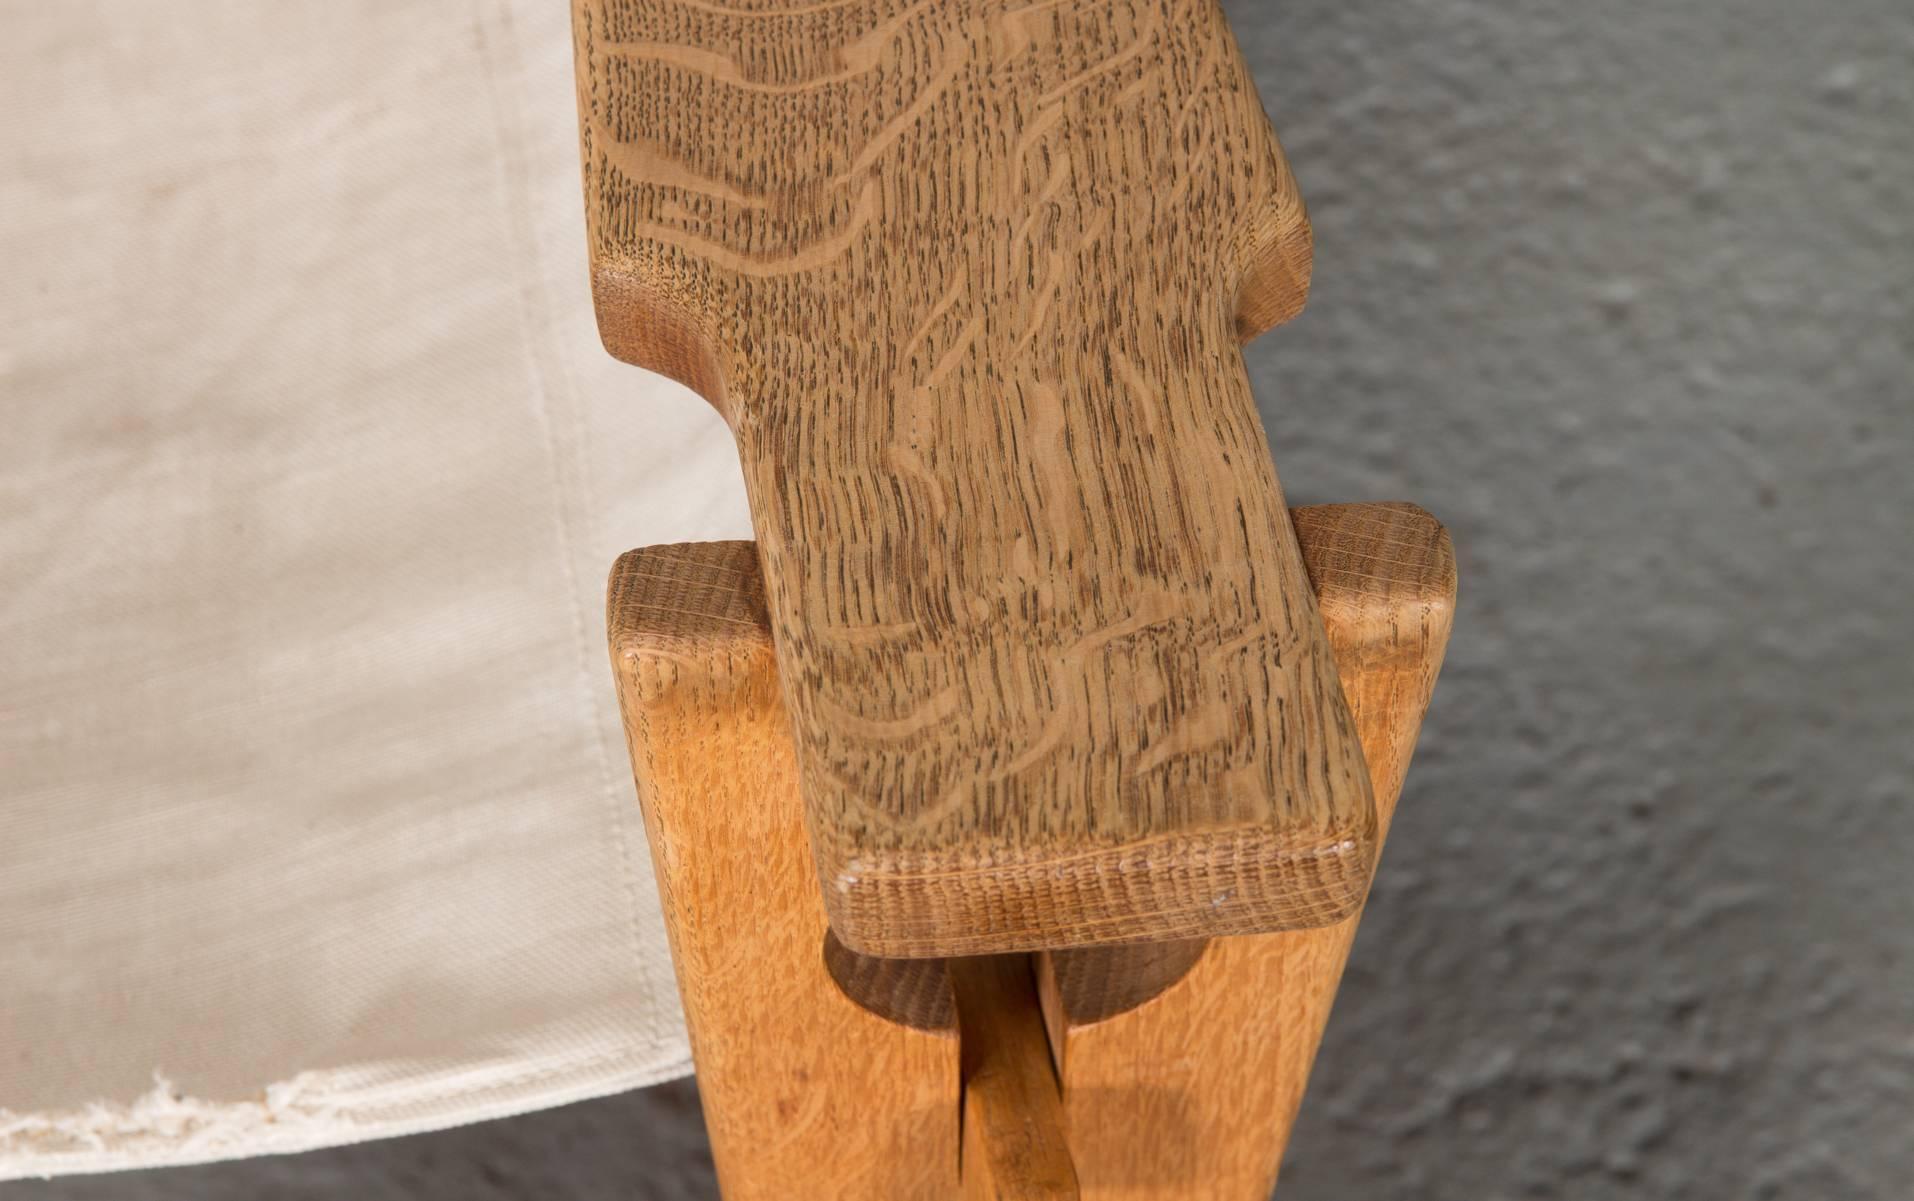 hans wegner rocking chair revolving buy online superb keyhole by decaso fritz hansen for sale image 4 of